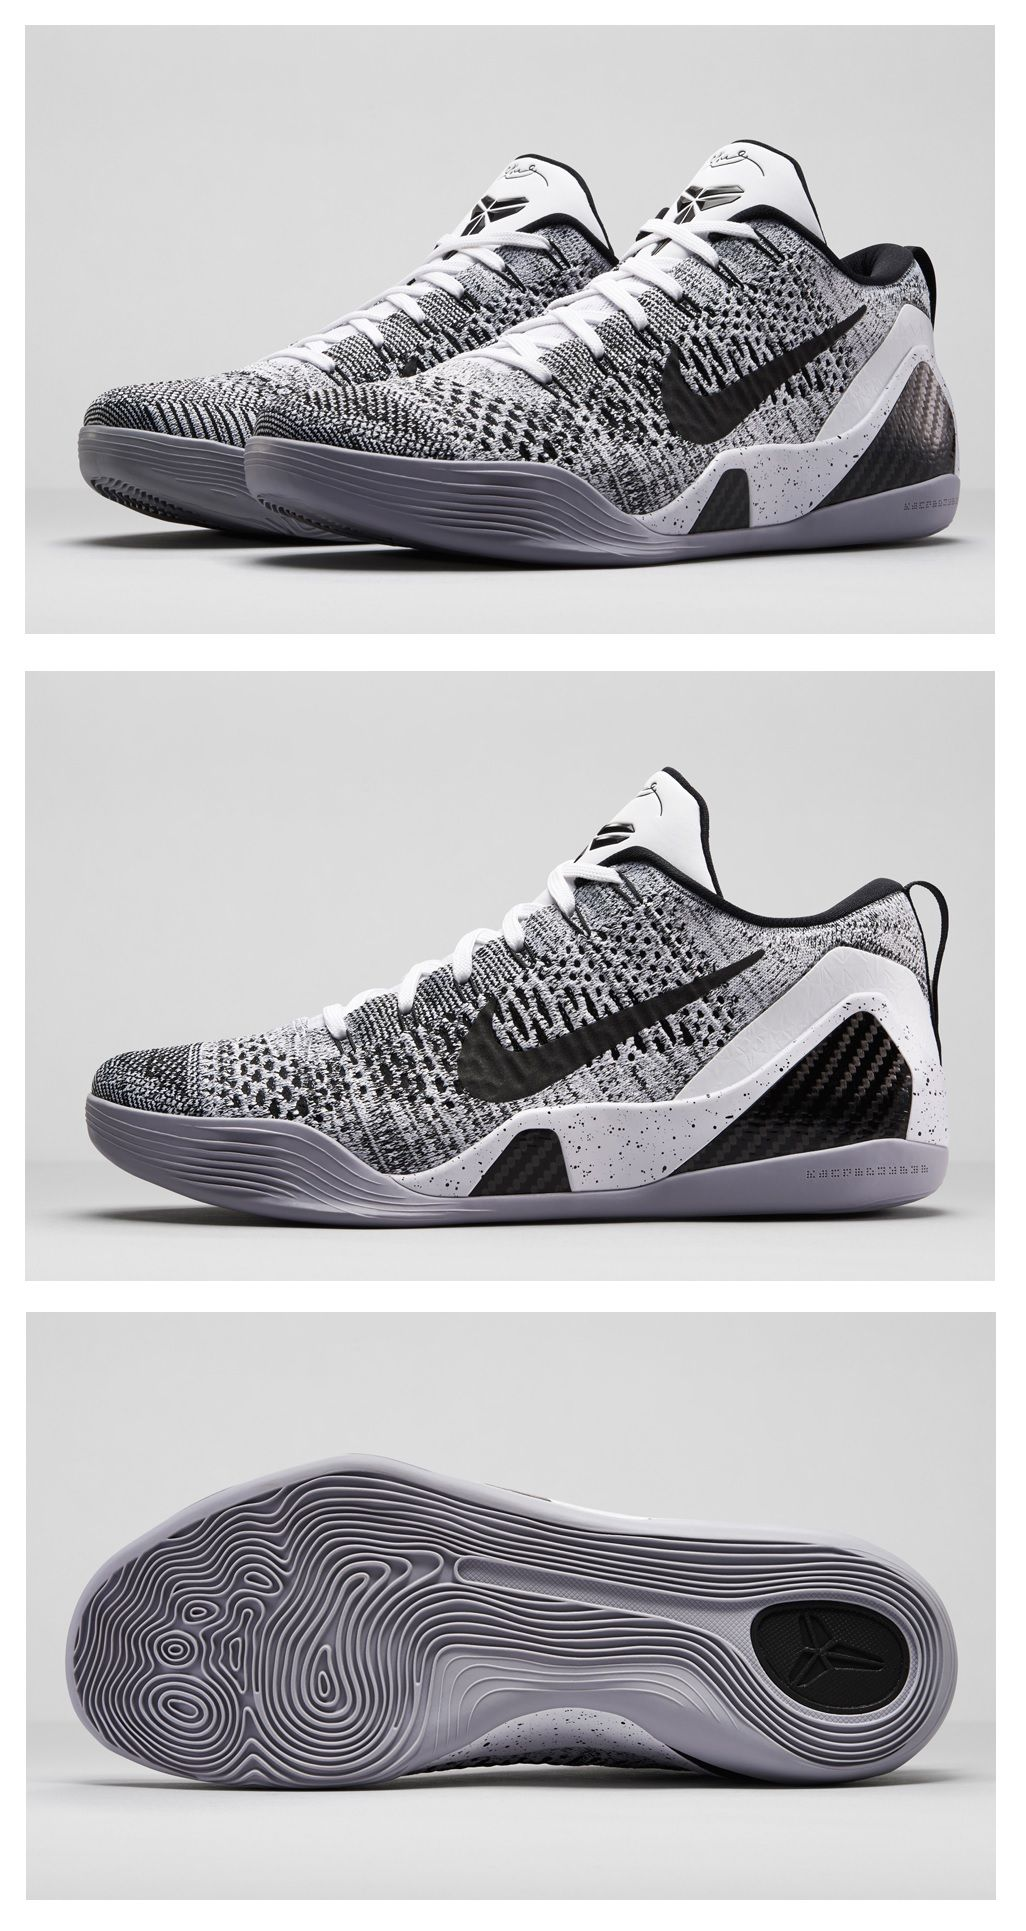 new style 8a659 75f8d Nike Kobe IX Low  Beethoven  · Zapatos 2017Zapatillas ...